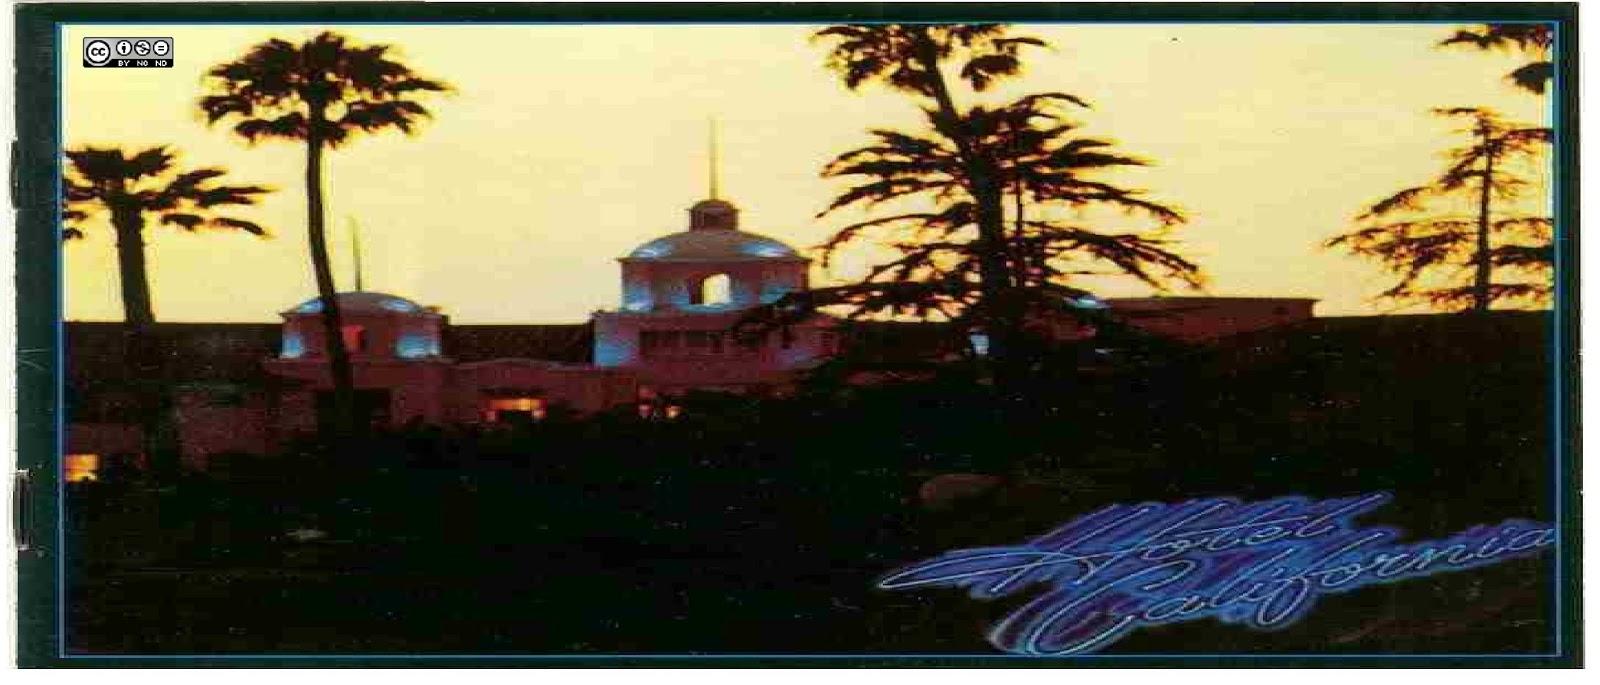 Radio tanambi on air for Hotel california